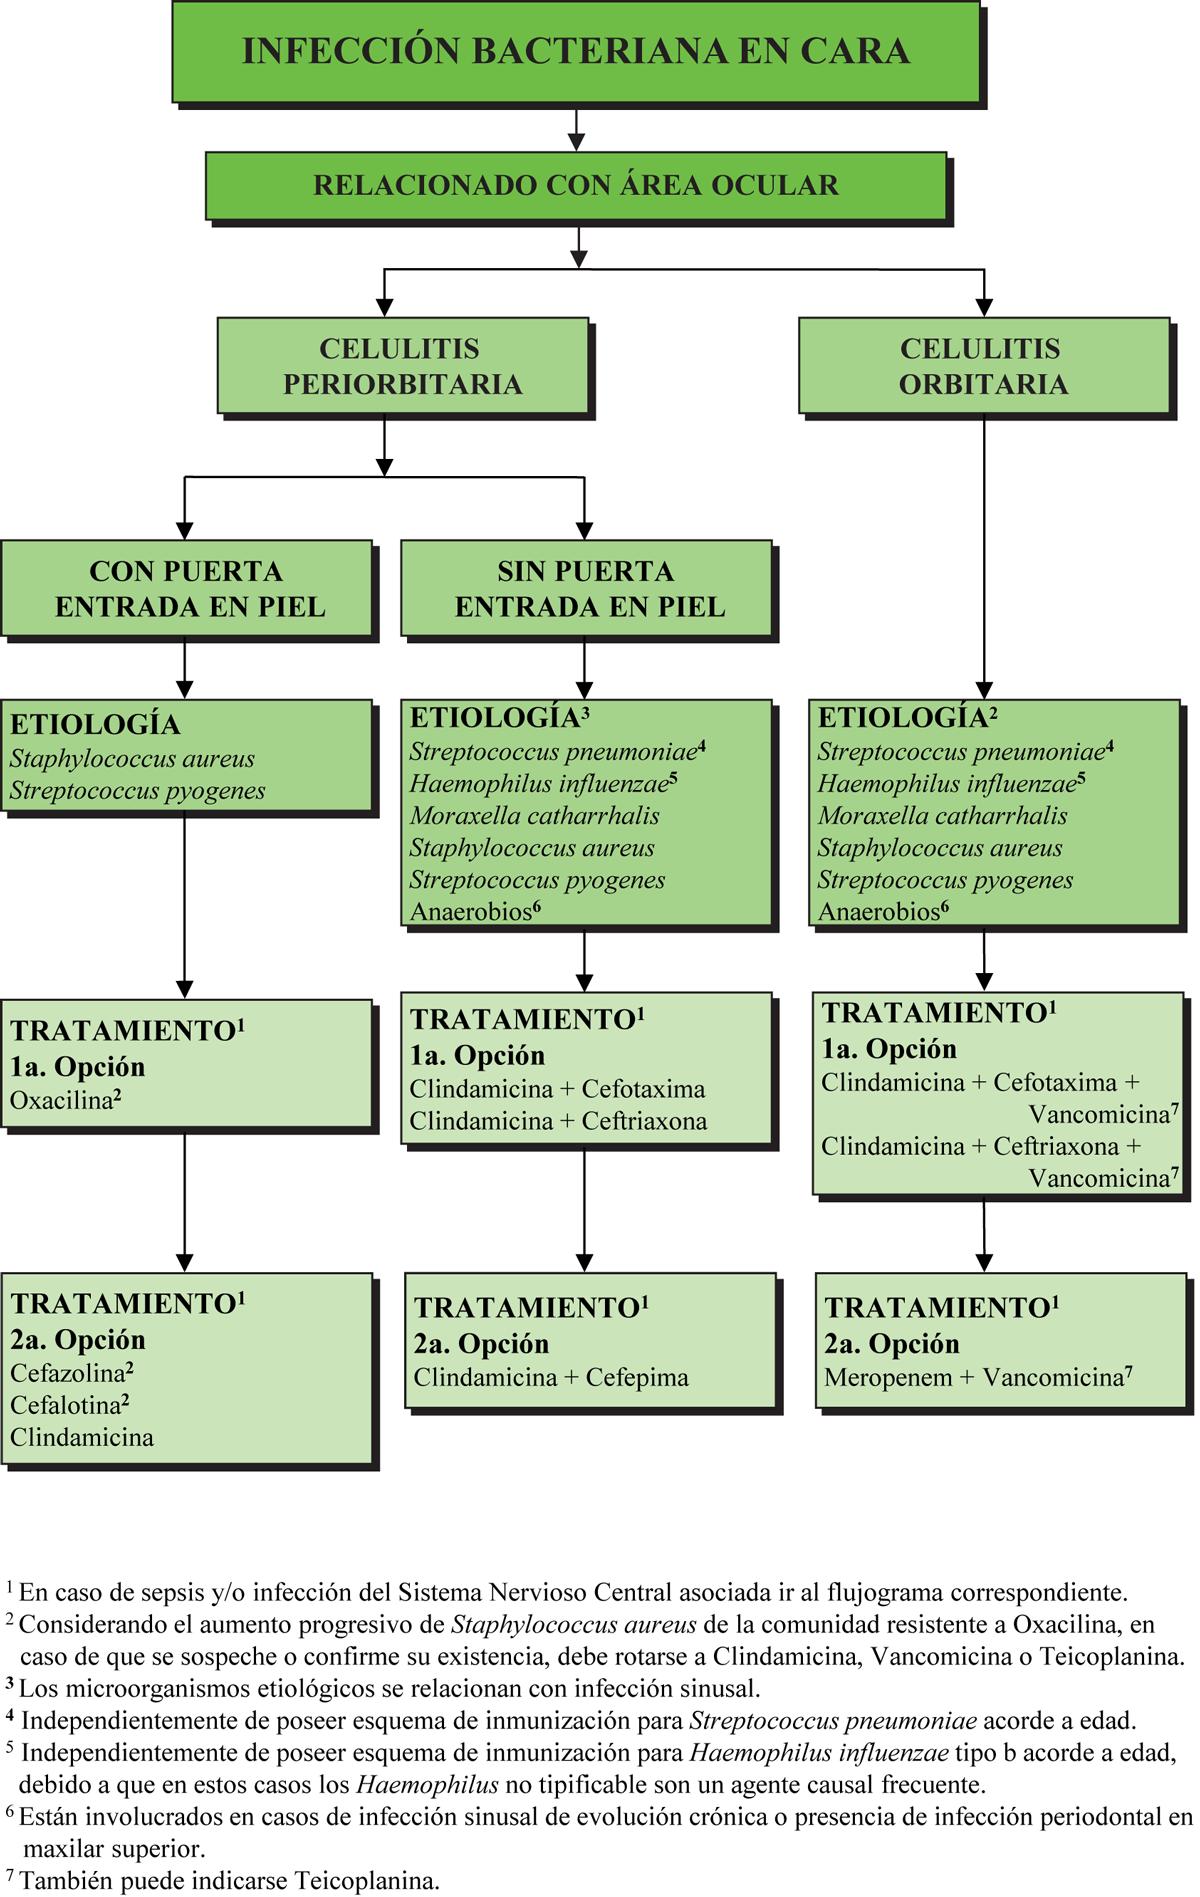 botica16-F6